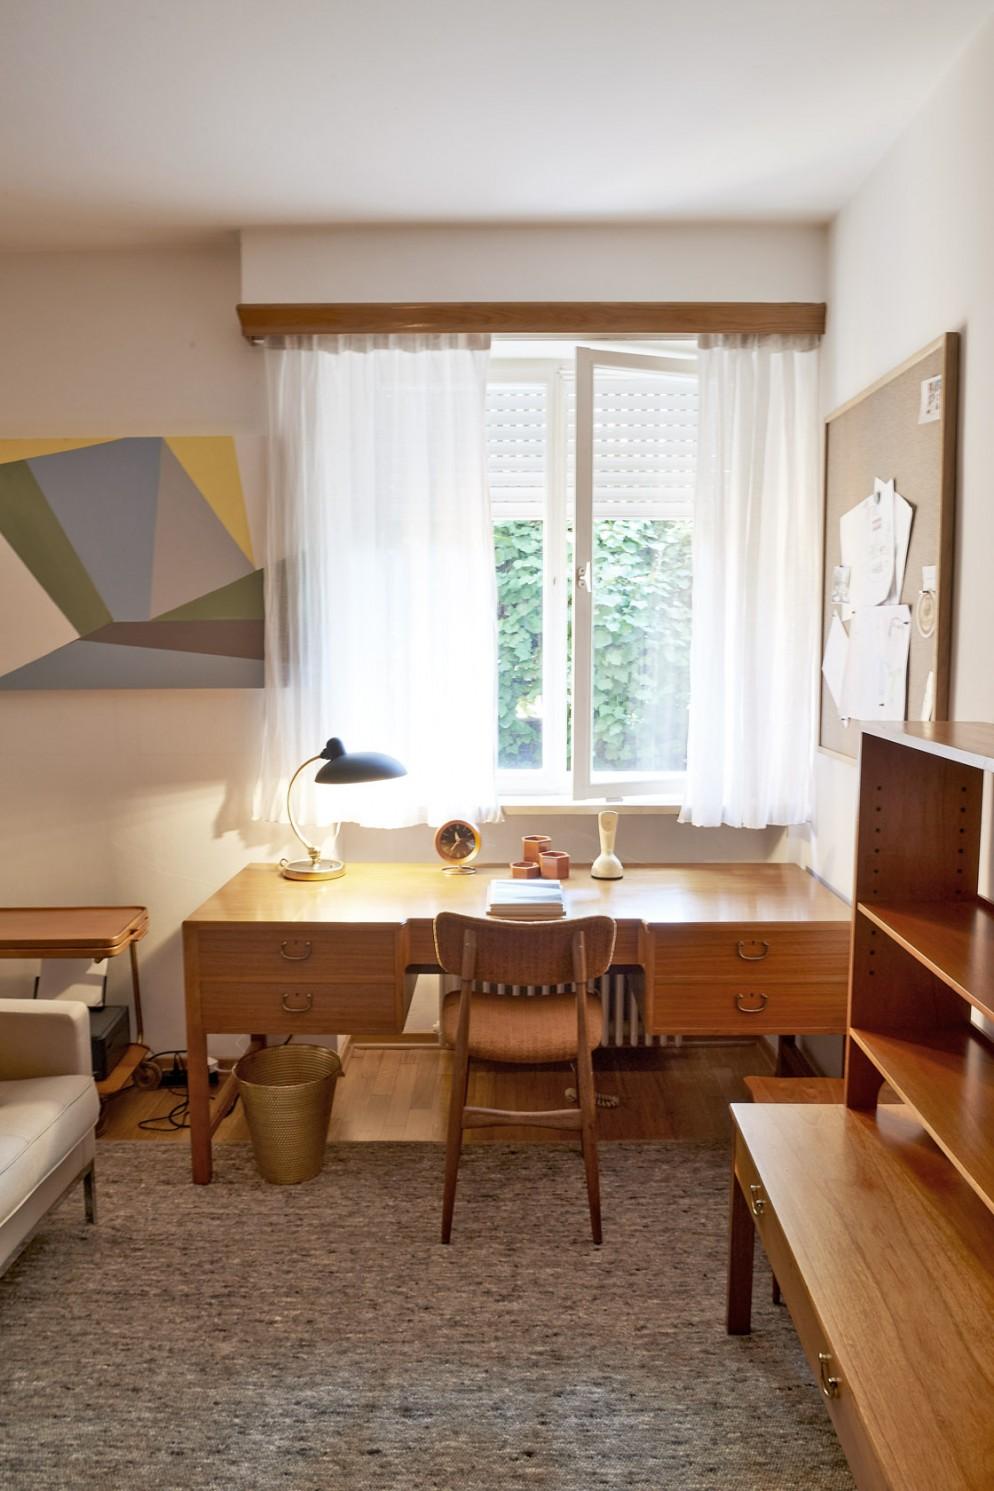 villa-fiuggi-merano-tyler-brûlé-architetto-Valtingojer06